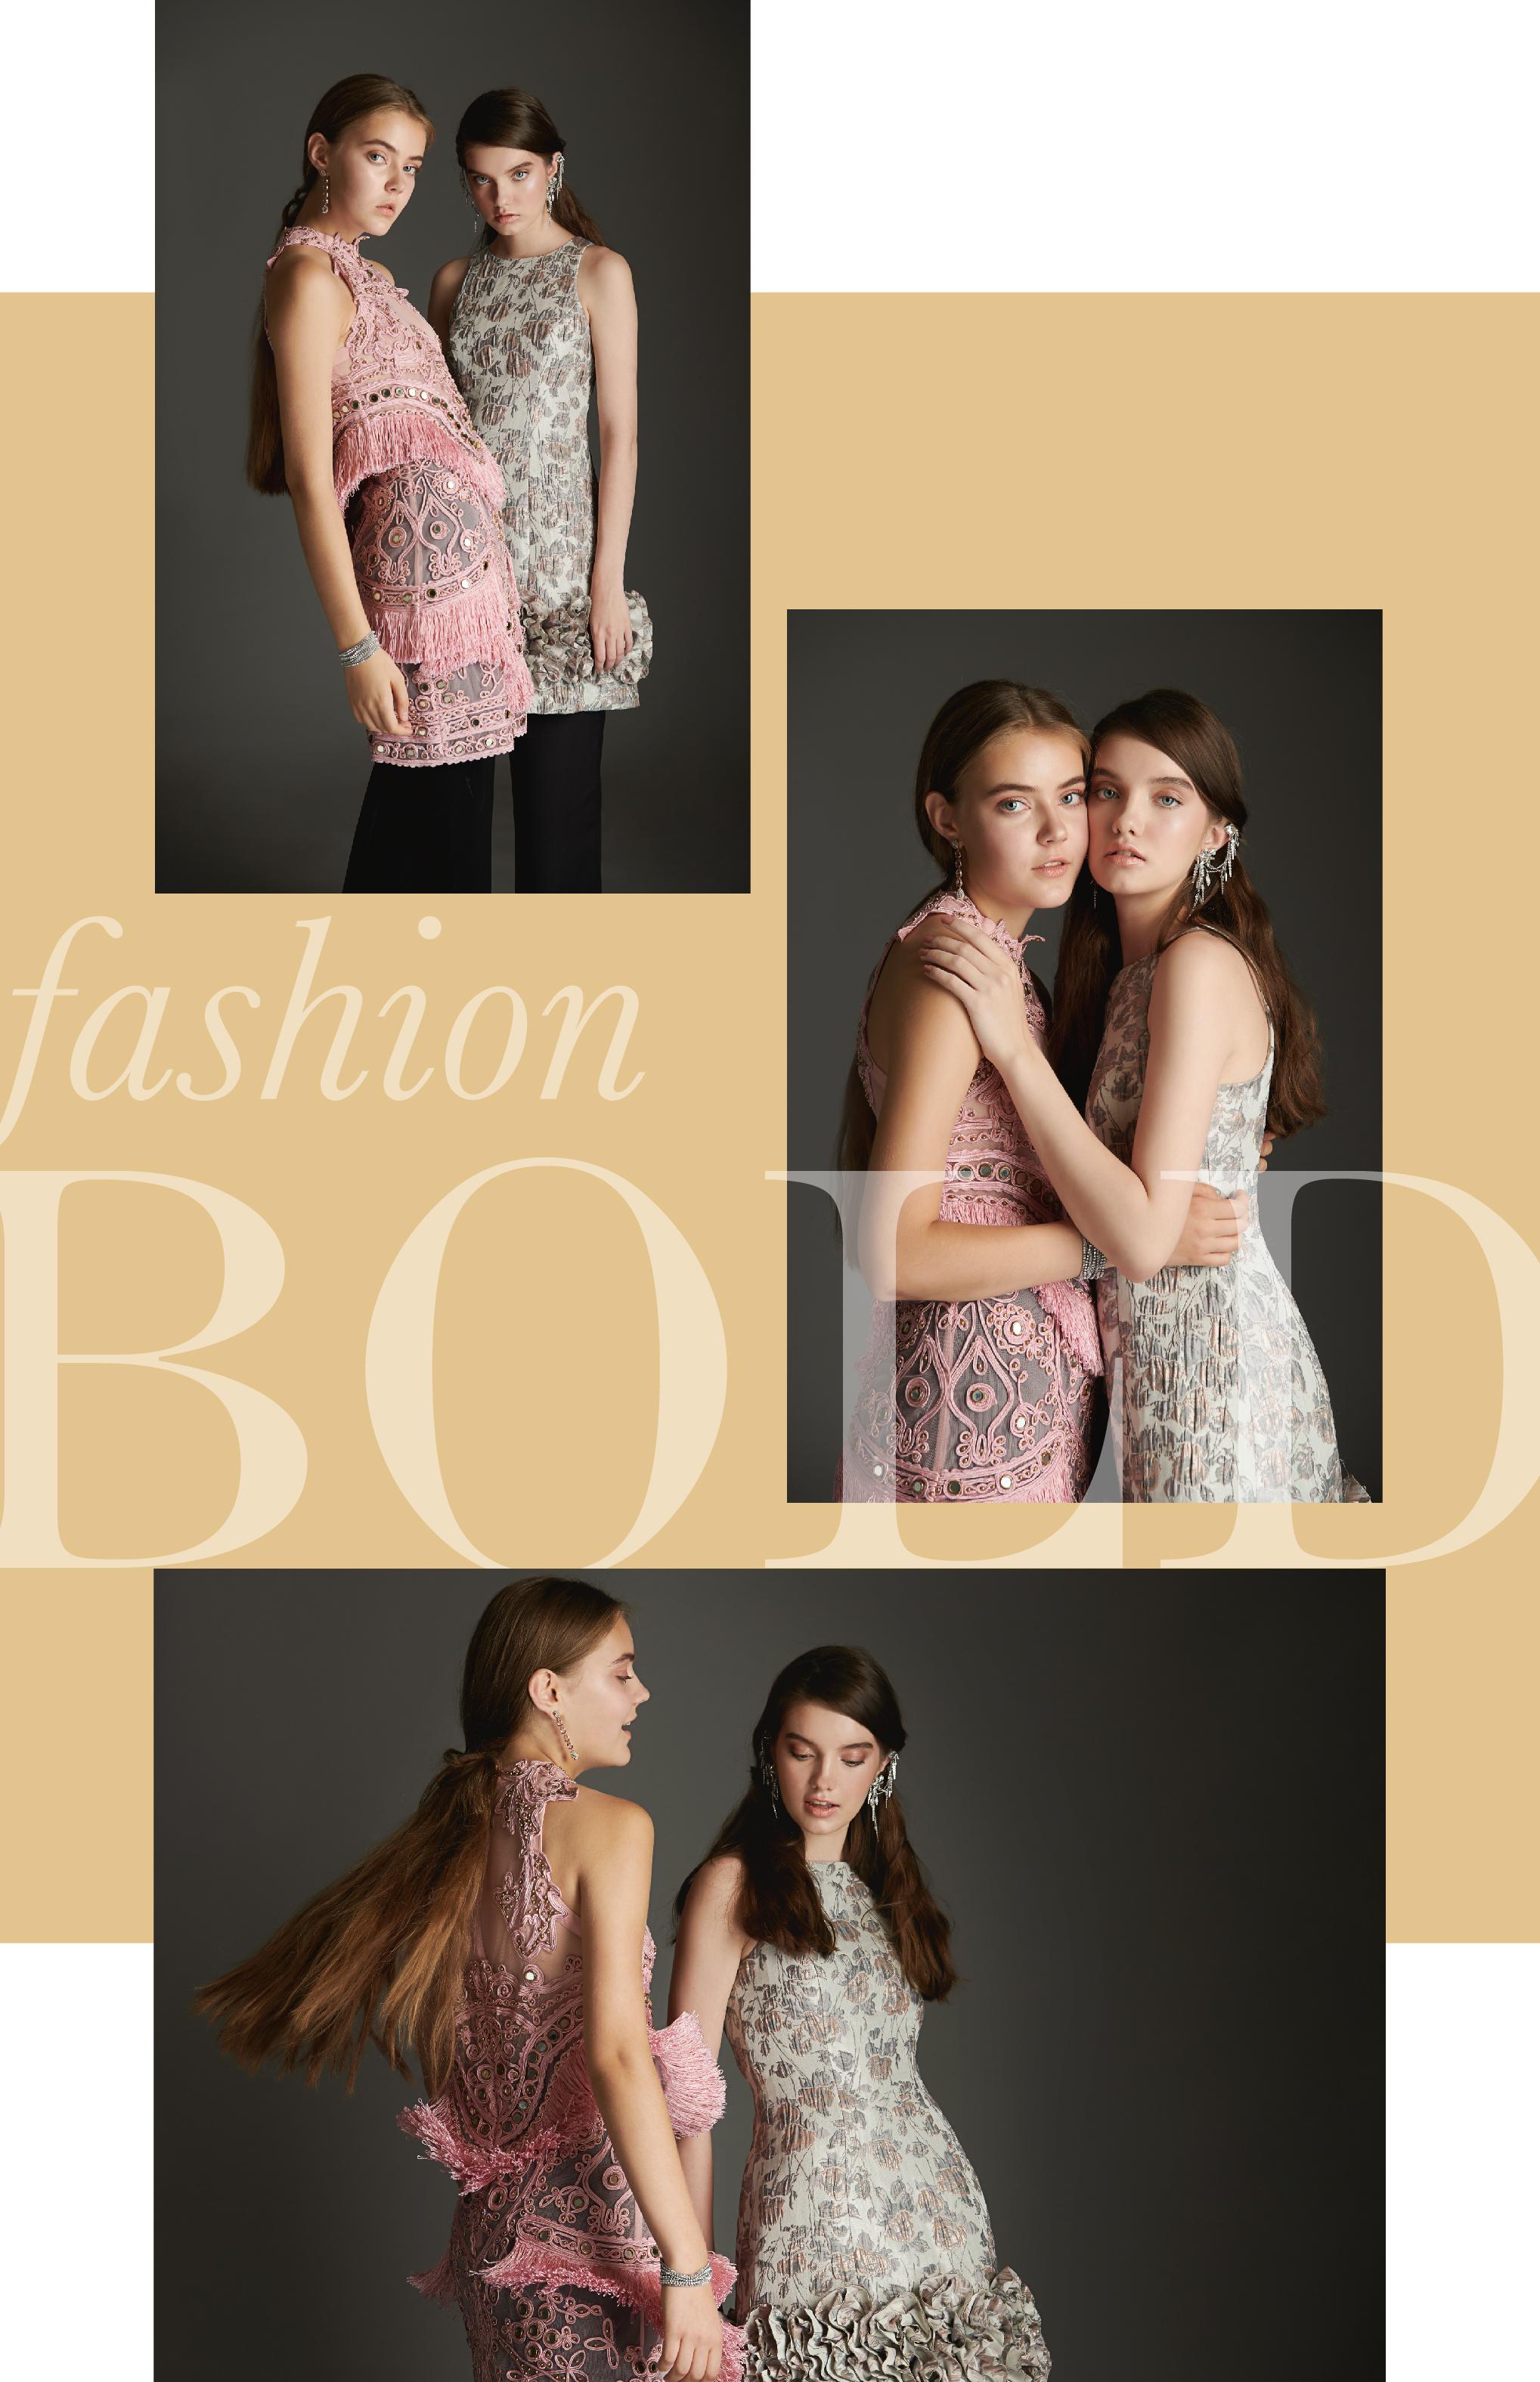 https://s3-ap-southeast-1.amazonaws.com/bchurunway/lookbook/fashion-bold/lookbook_fashion+Bold_edit+photo-06.jpg